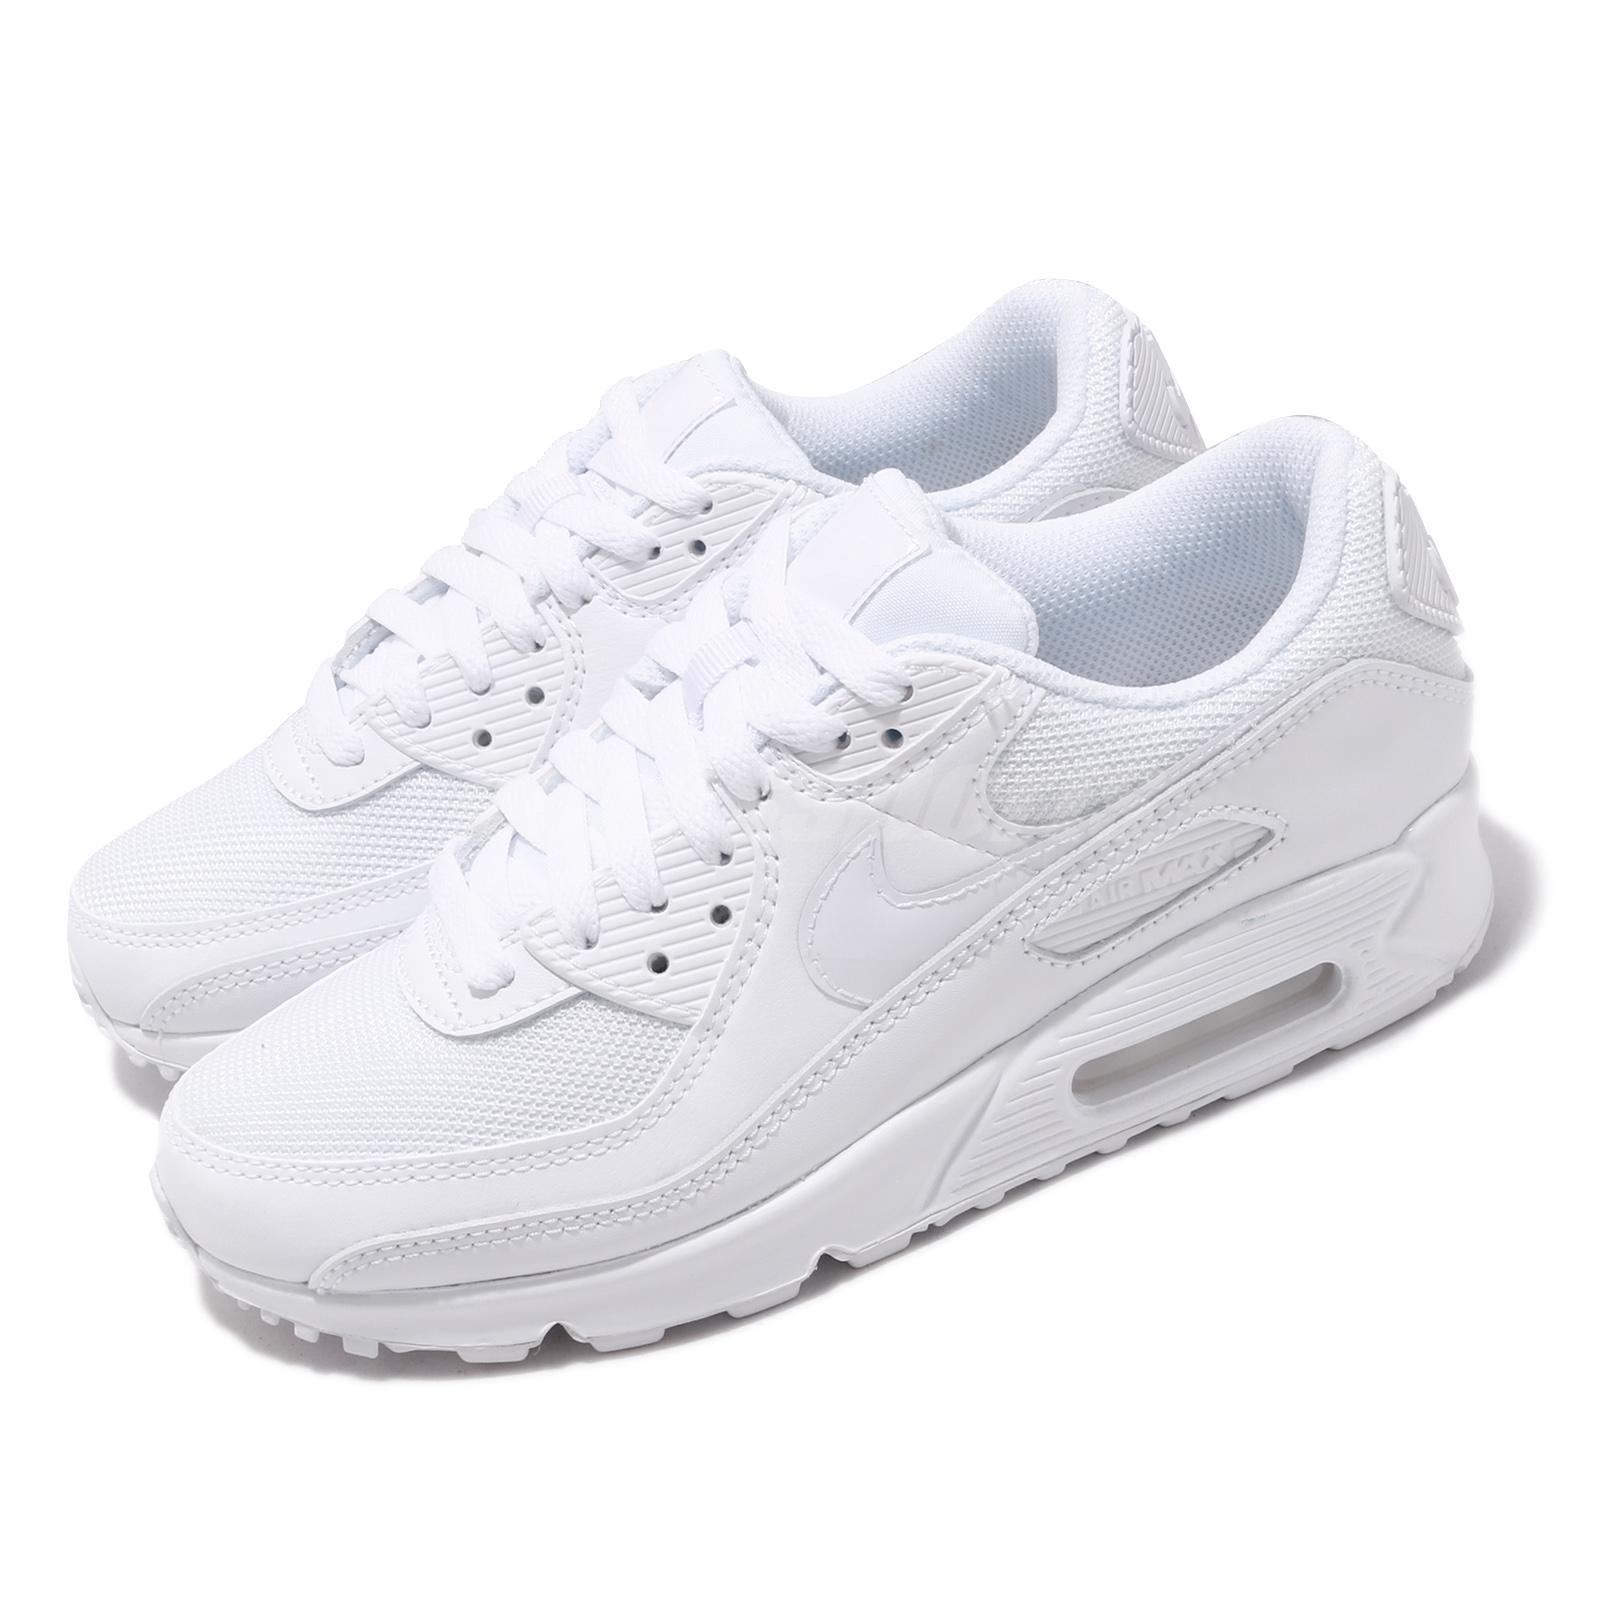 Nike Wmns Air Max 90 Twist White Women Classic Casual Lifestyle